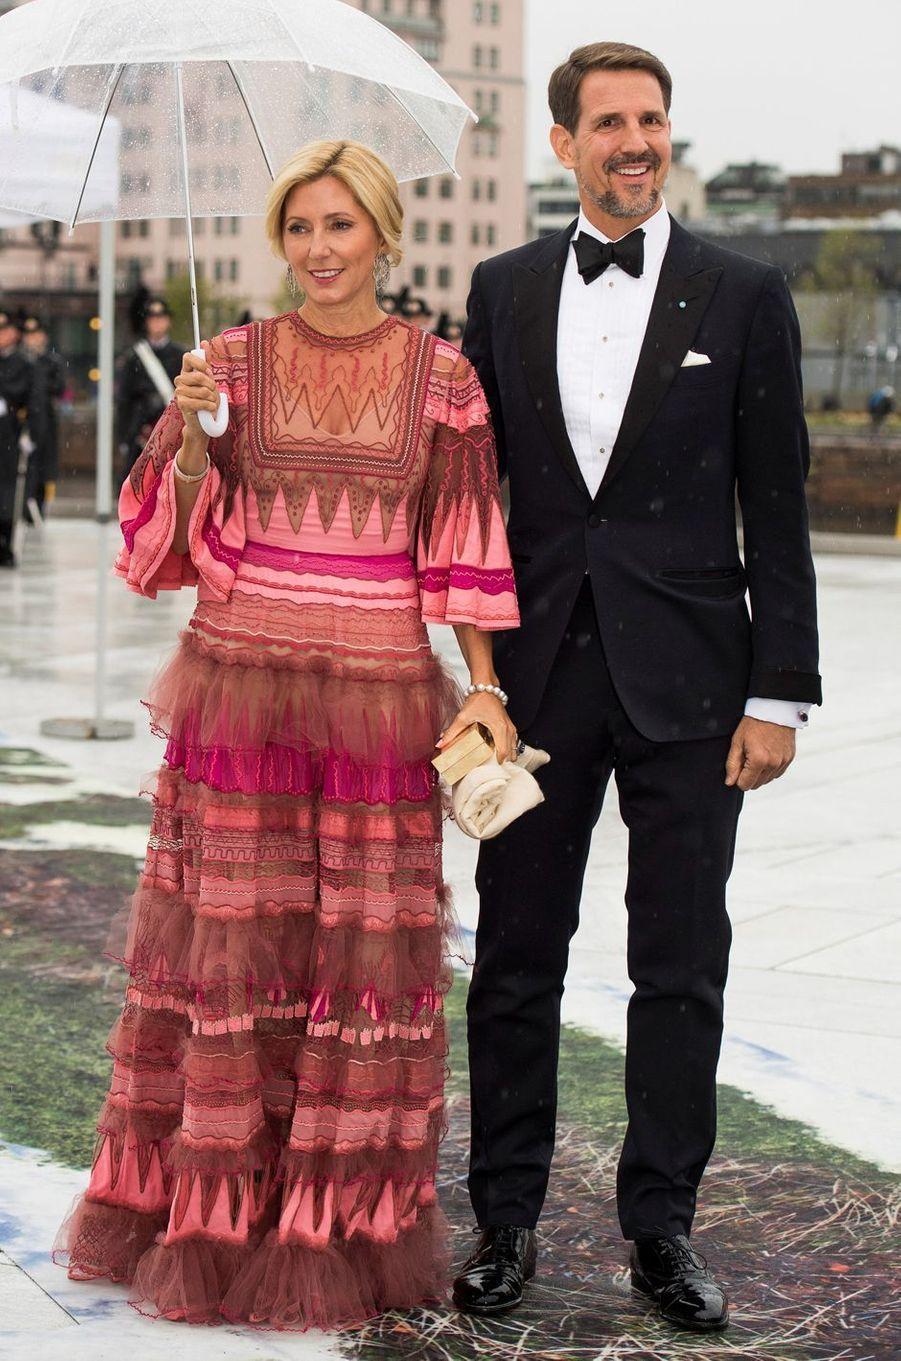 La princesse Marie-Chantal de Grèce à Oslo le 10 mai 2017